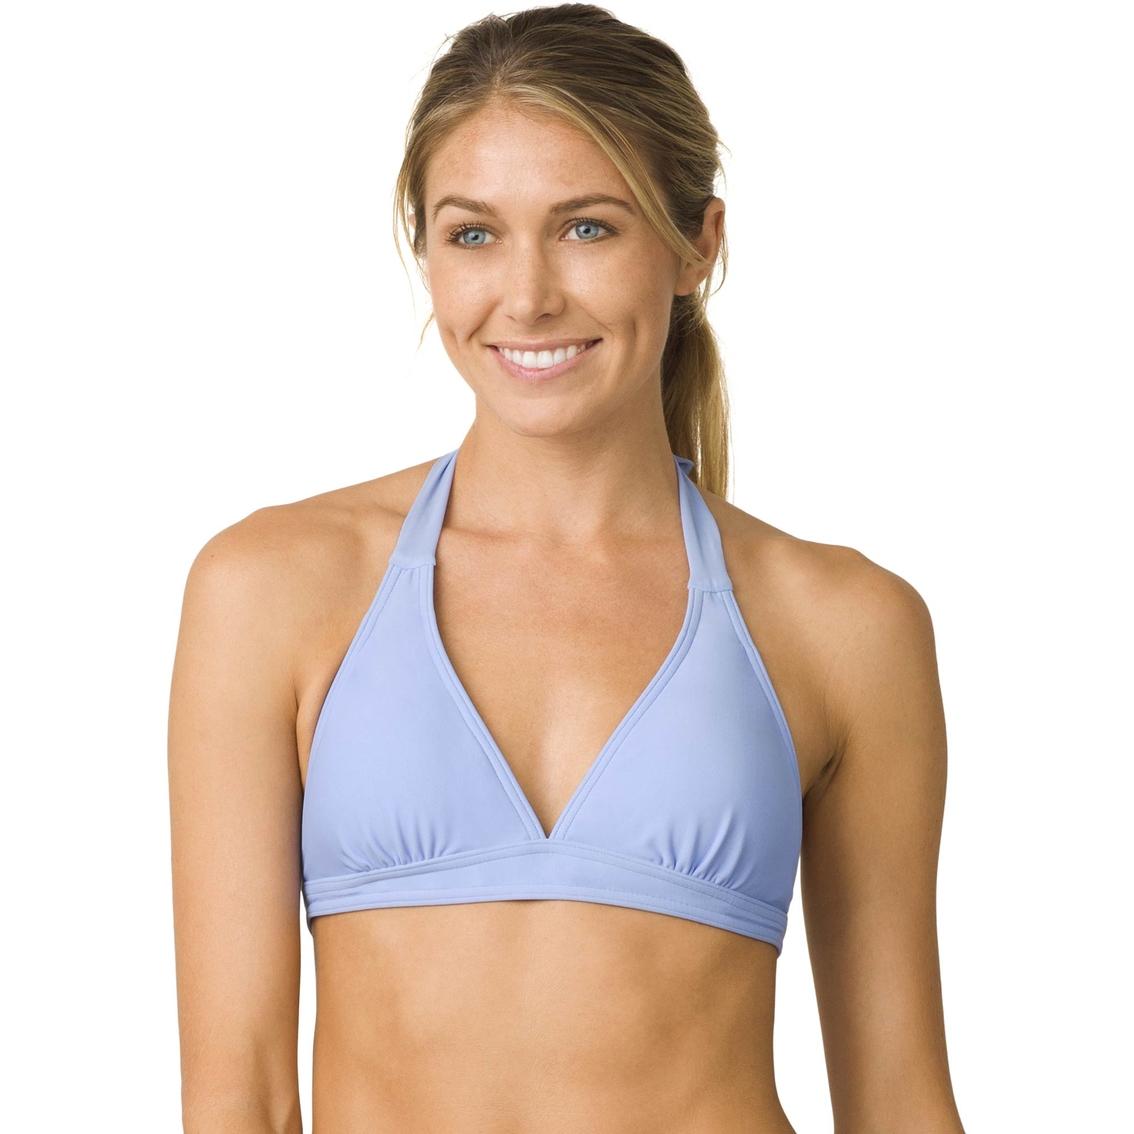 404b4a2657bd0 Prana Lahari Halter Swim Top | Swimwear | Apparel | Shop The Exchange